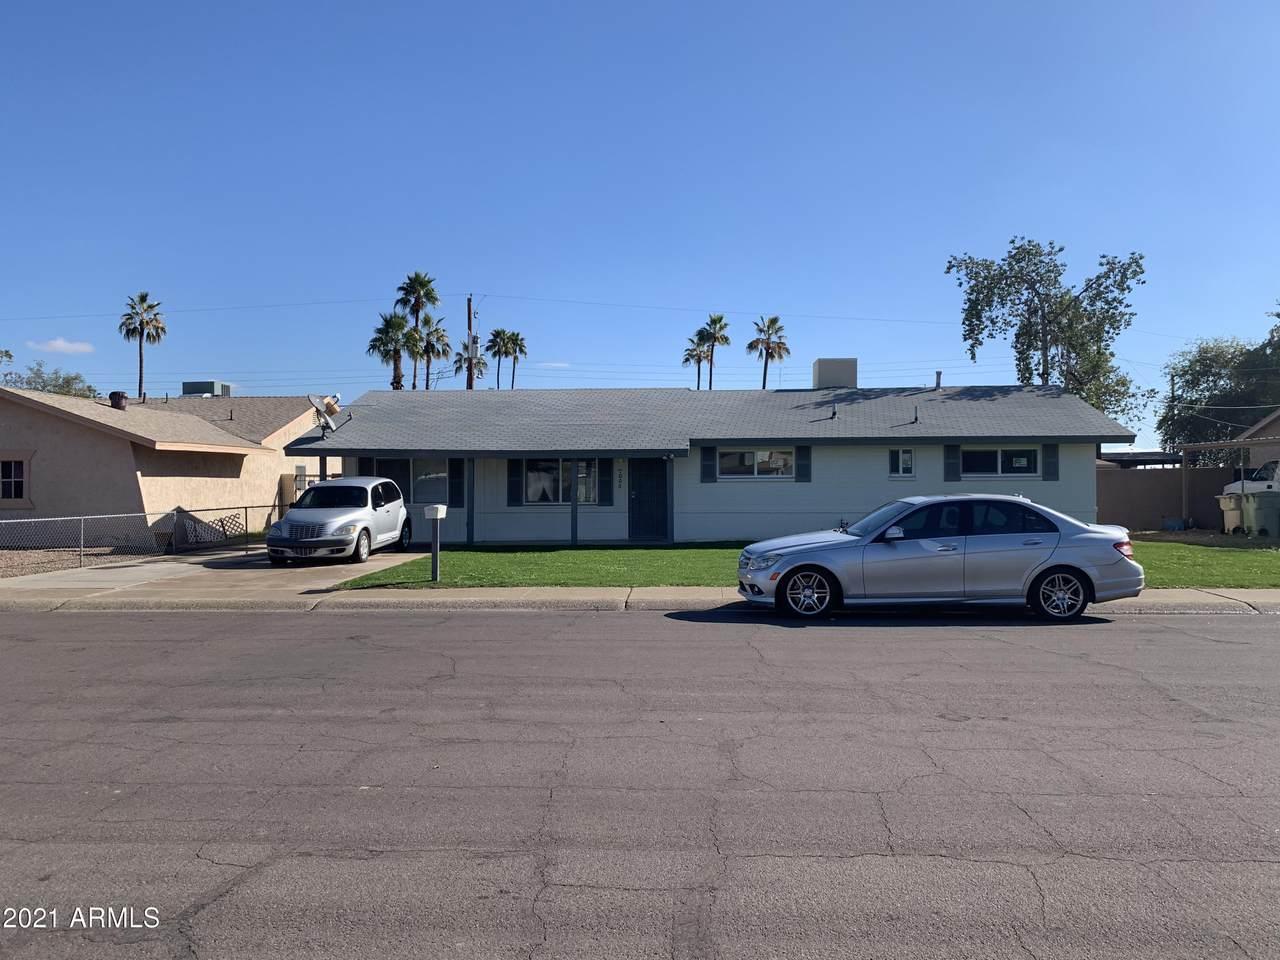 7005 76th Drive - Photo 1